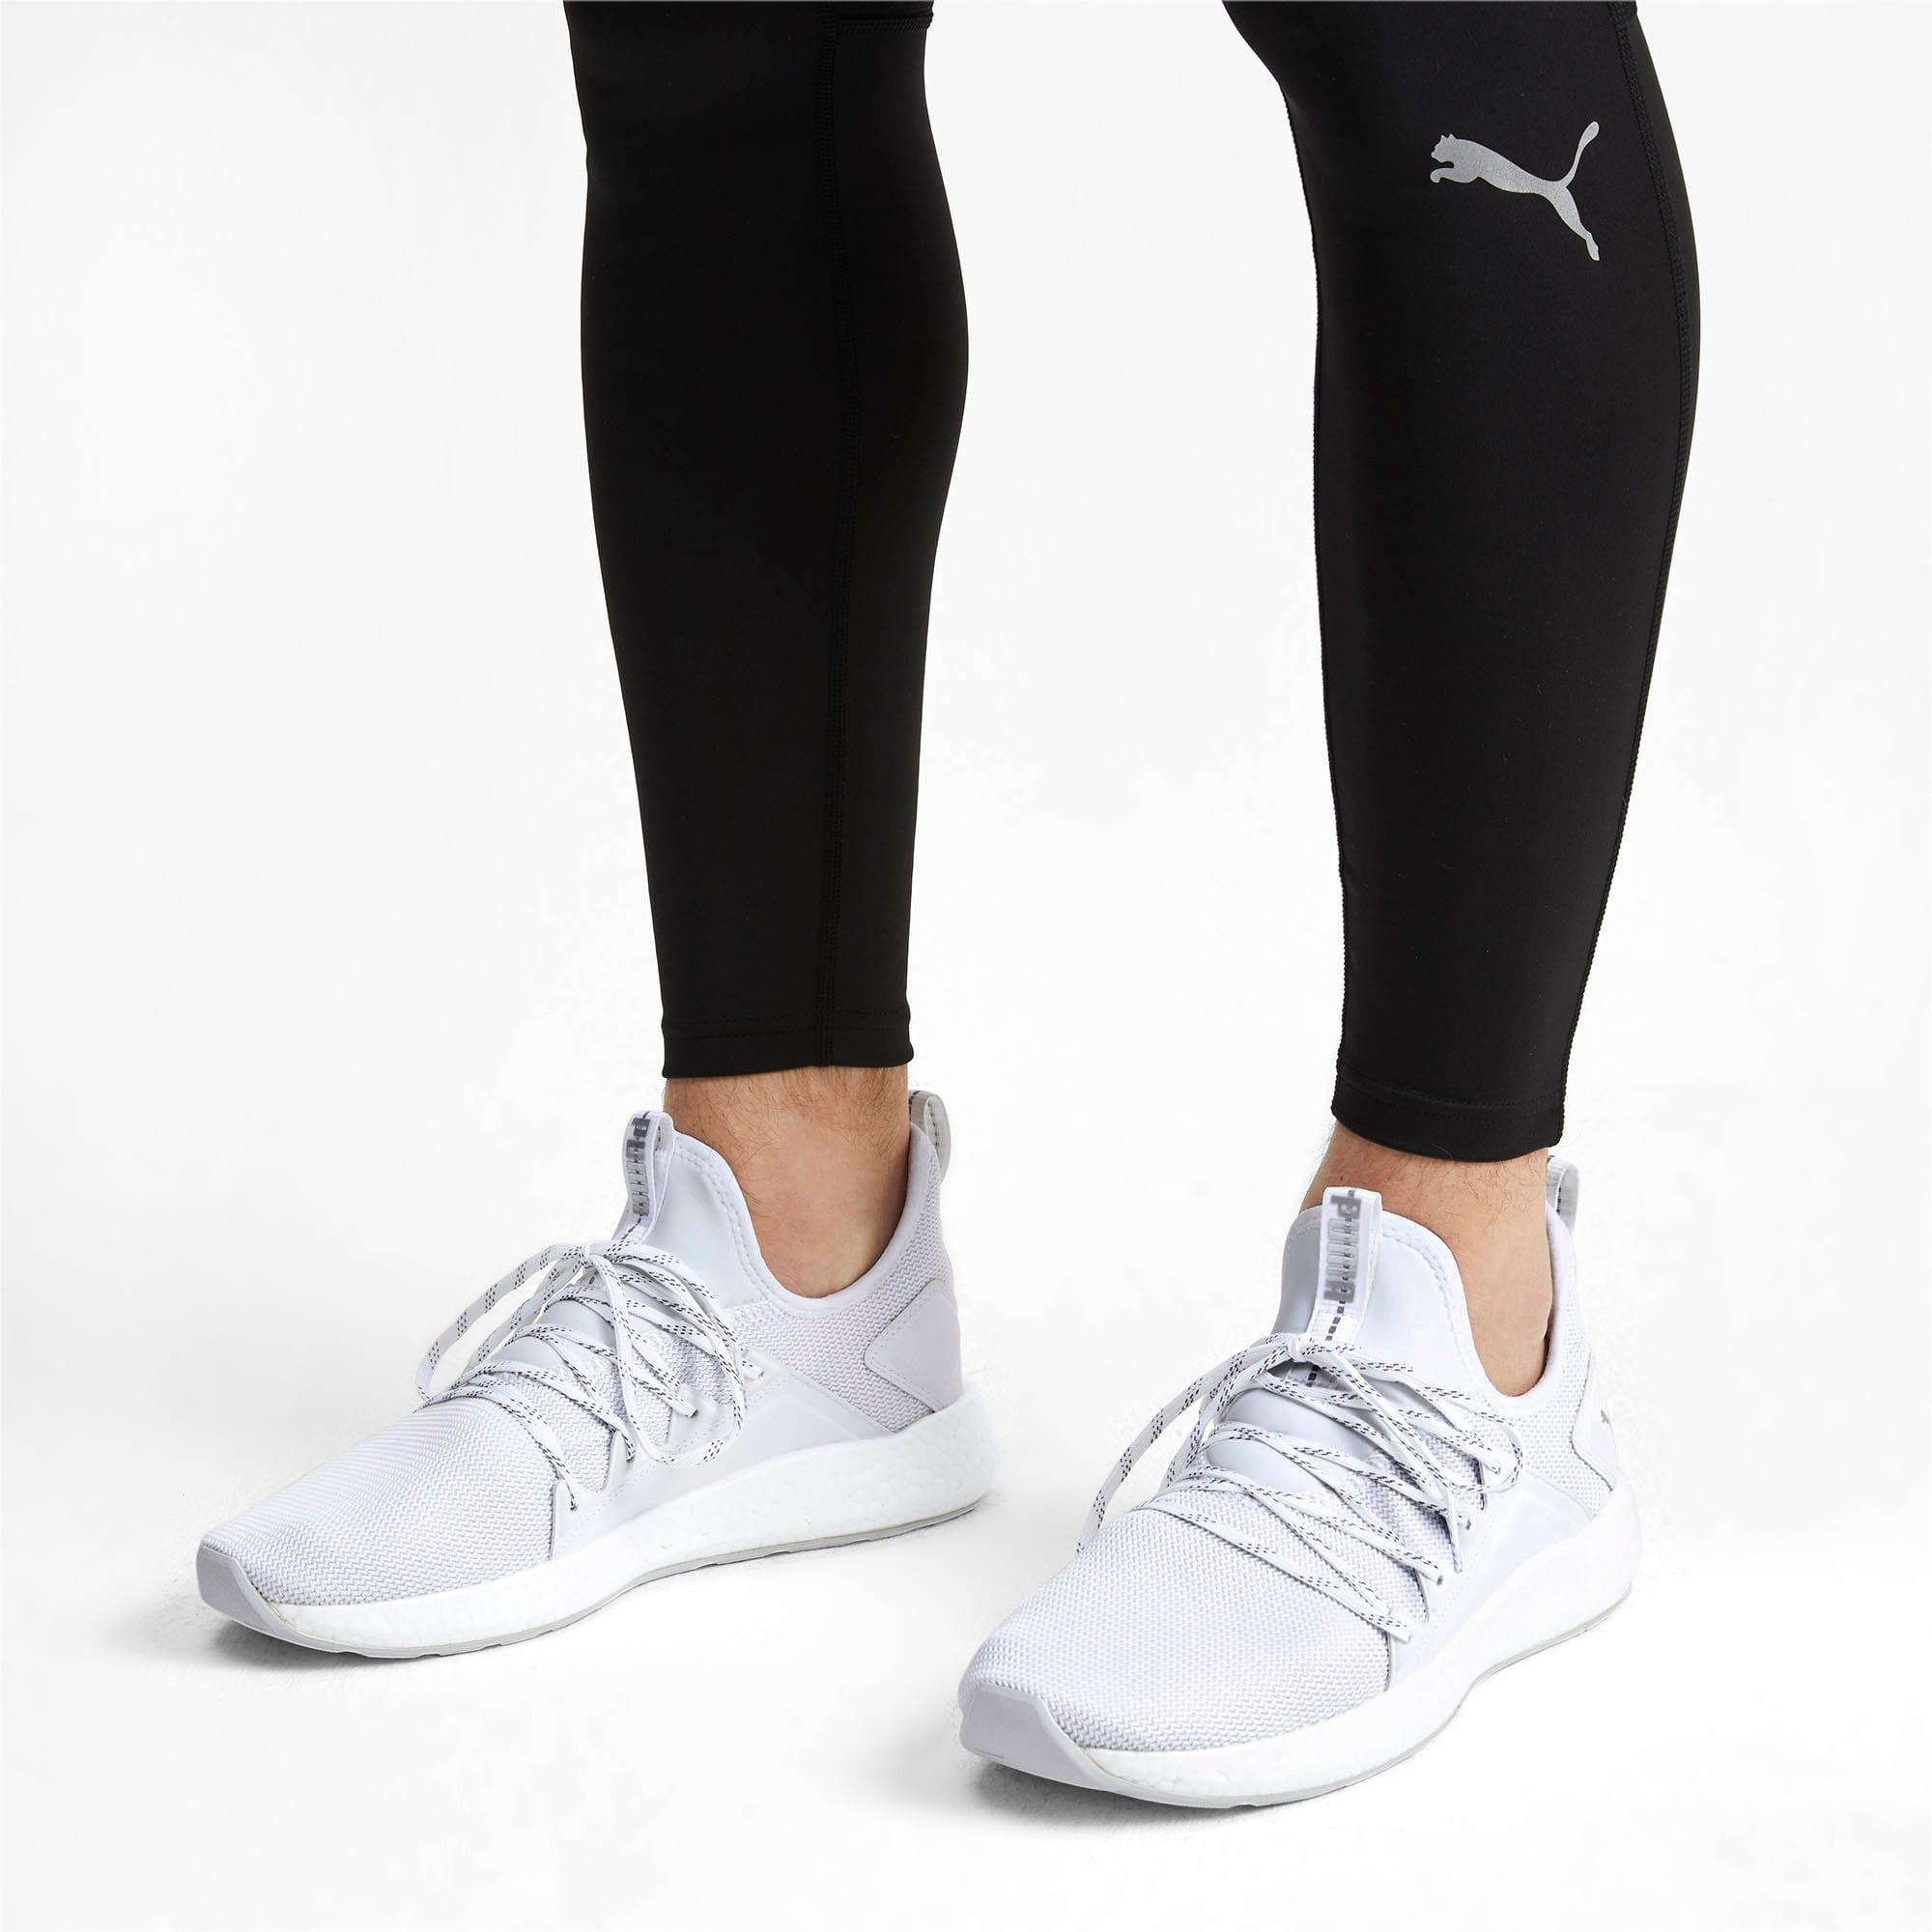 Thumbnail 2 of NRGY Neko Lights Men's Running Shoes, Puma White, medium-IND